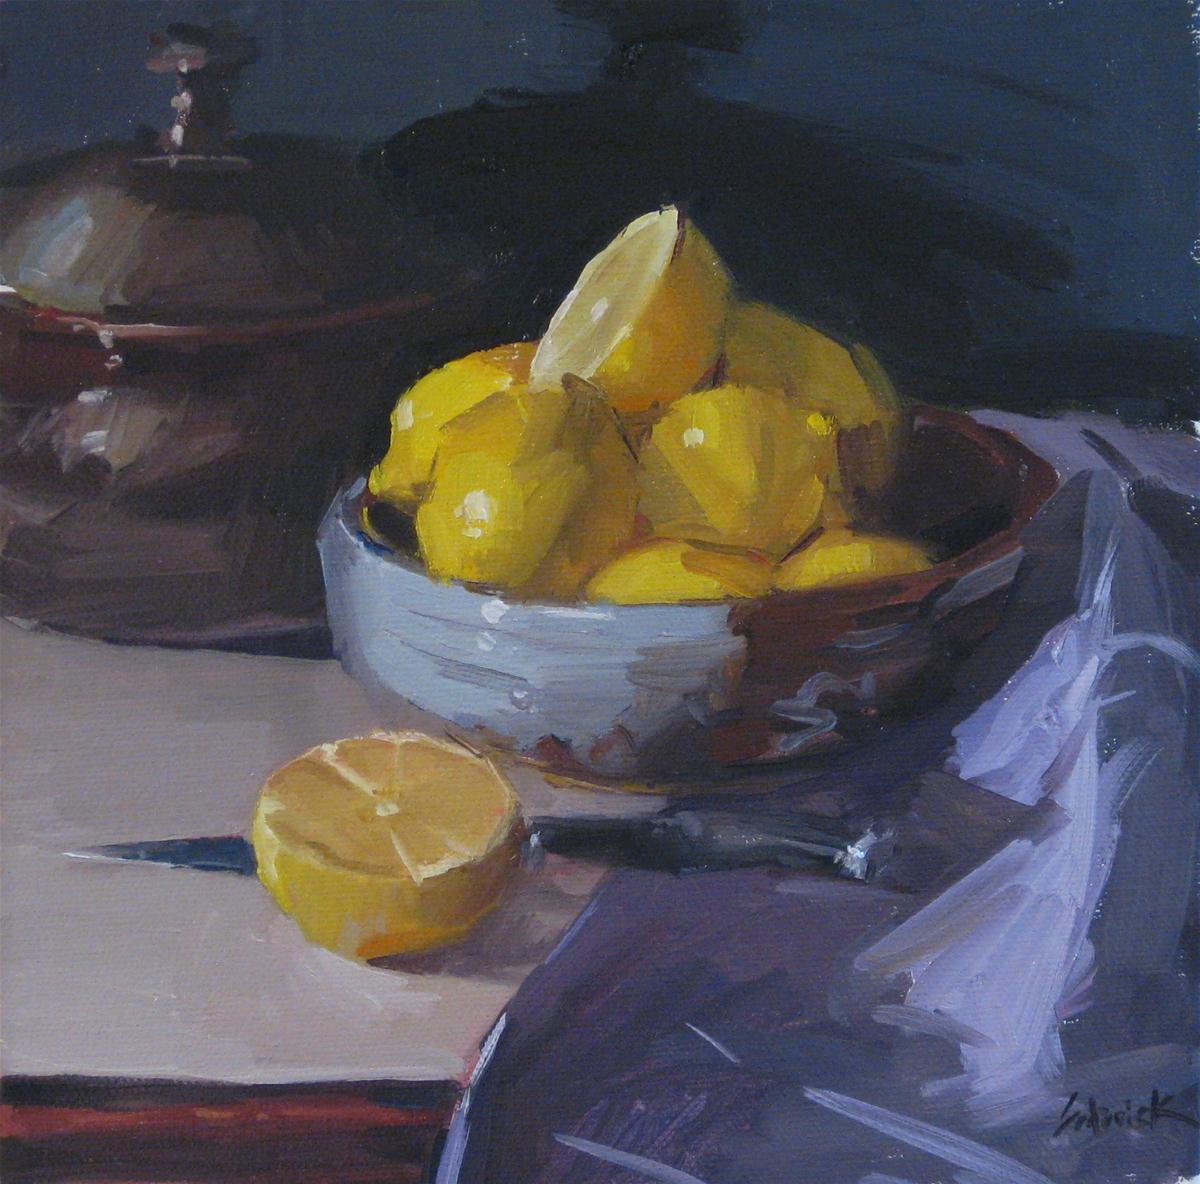 """Lemon Bowl with Knife - Framed"" original fine art by Sarah Sedwick"